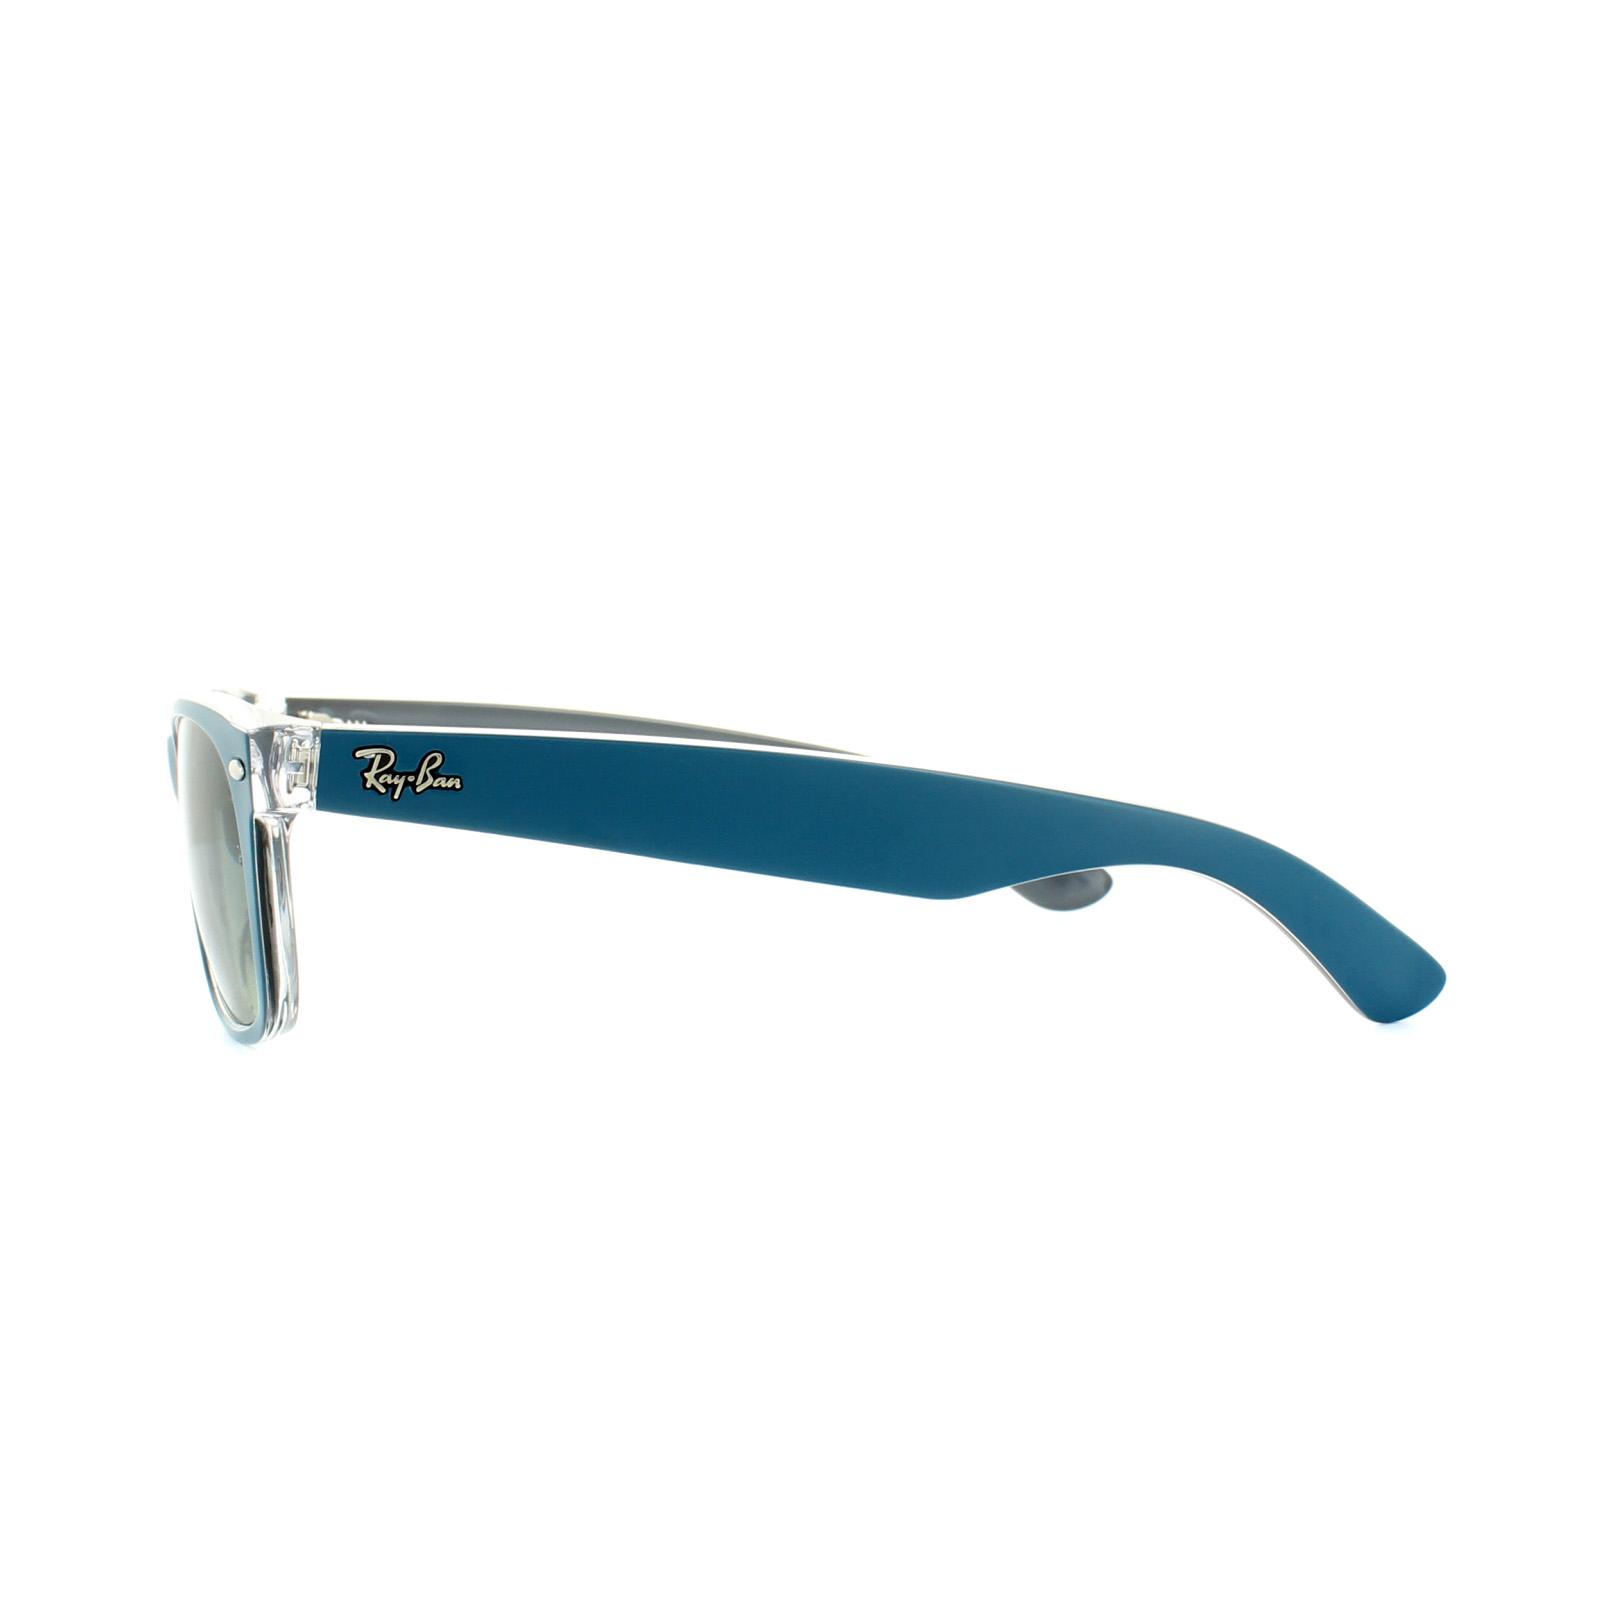 3f2500ecf3 Ray Bans Wayfarer Blue Grey Gradient